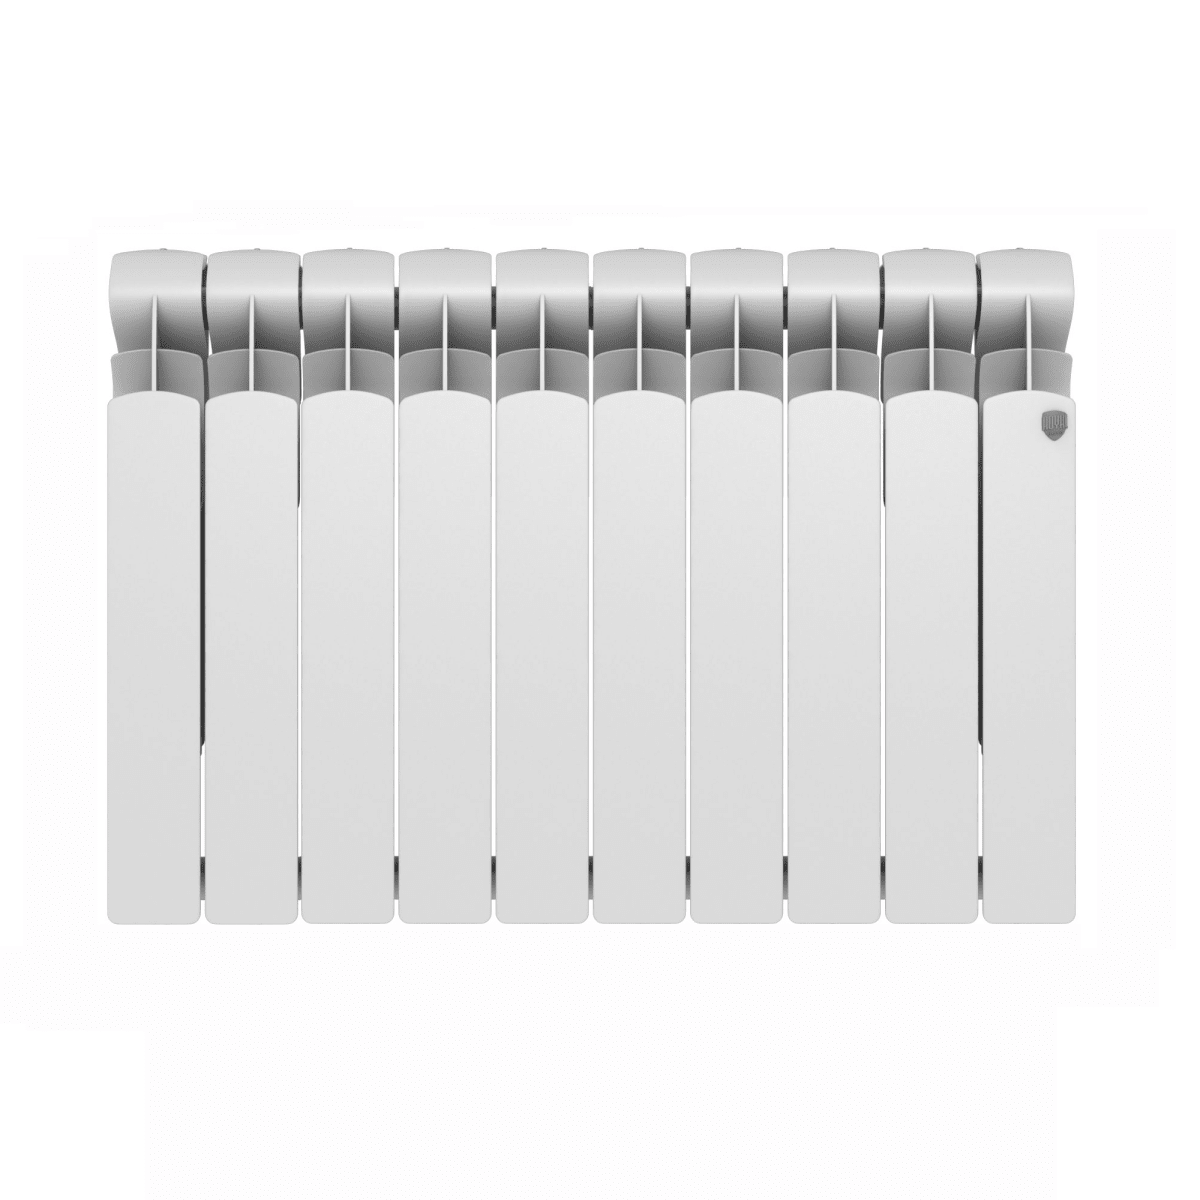 Радиатор биметаллический Royal Thermo Indigo 500, 10 секций